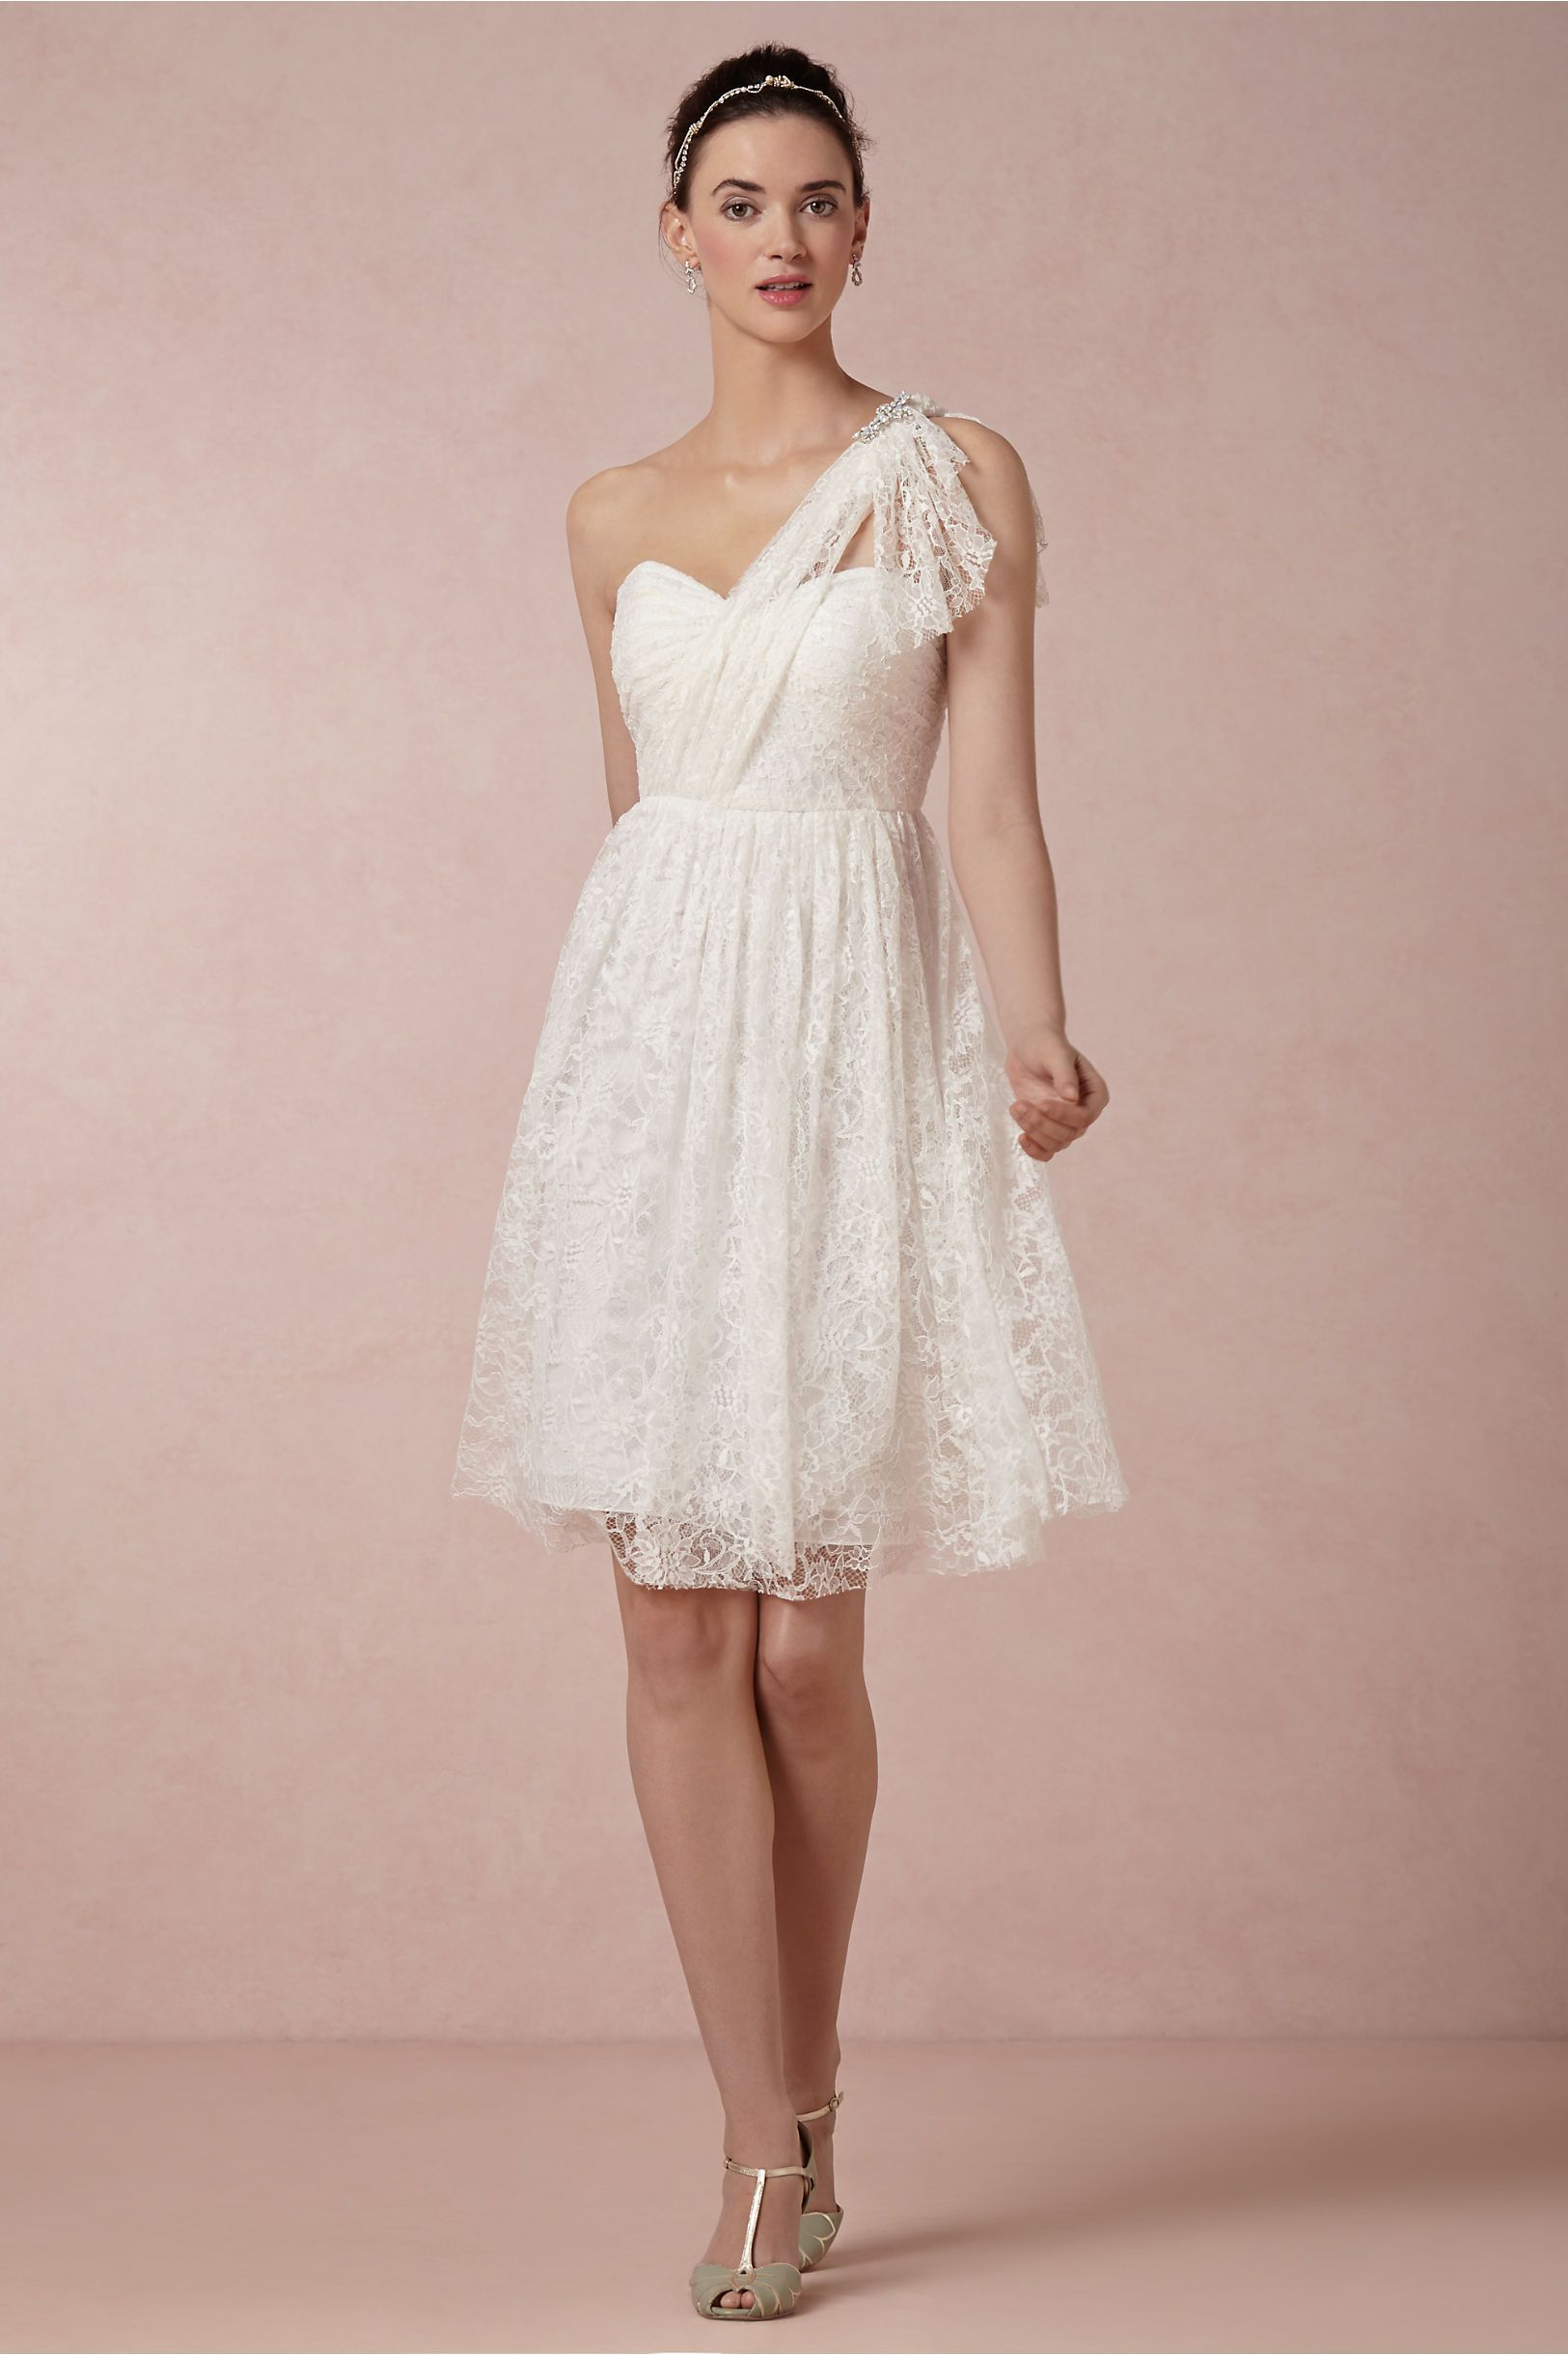 43032cdf5d10 Tilly Dress from BHLDN